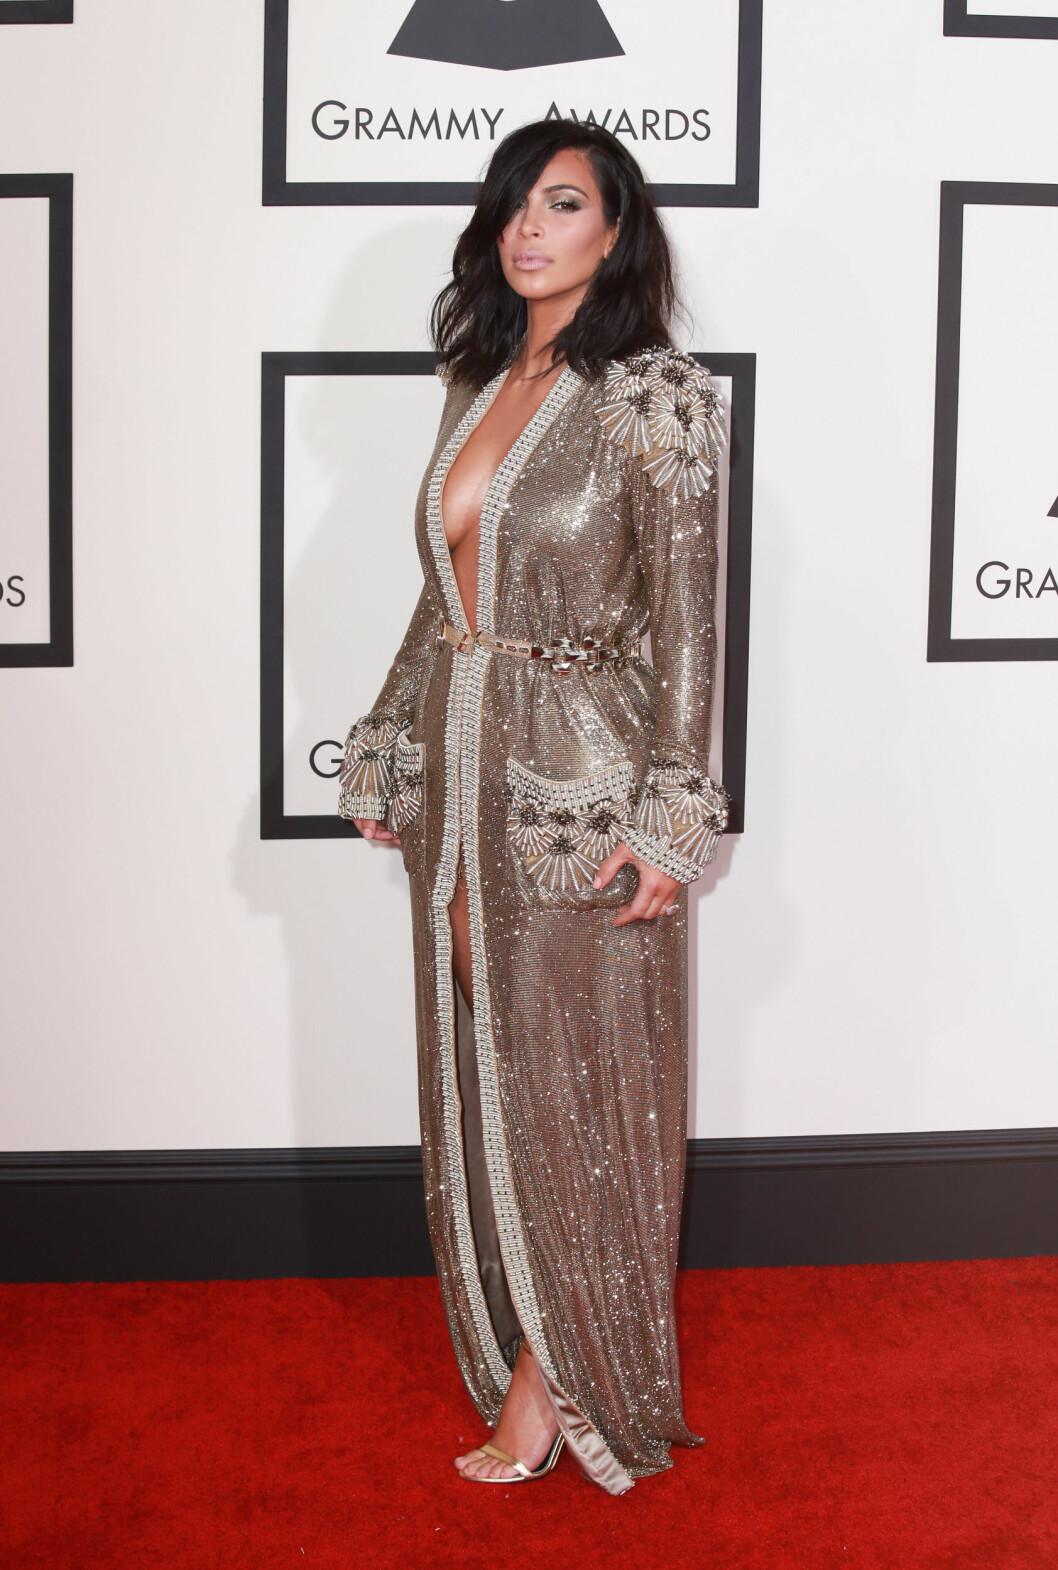 The 57th Annual Grammy Awards red carpet on February 8, 2015 in Los Angeles, California.  Pictured: Kim Kardashian Ref: SPL945806  080215   Picture by: Splash News  Splash News and Pictures Los Angeles:310-821-2666 New York:212-619-2666 London:870-934-2666 photodesk@splashnews.com  Foto: Splash News/ All Over Press